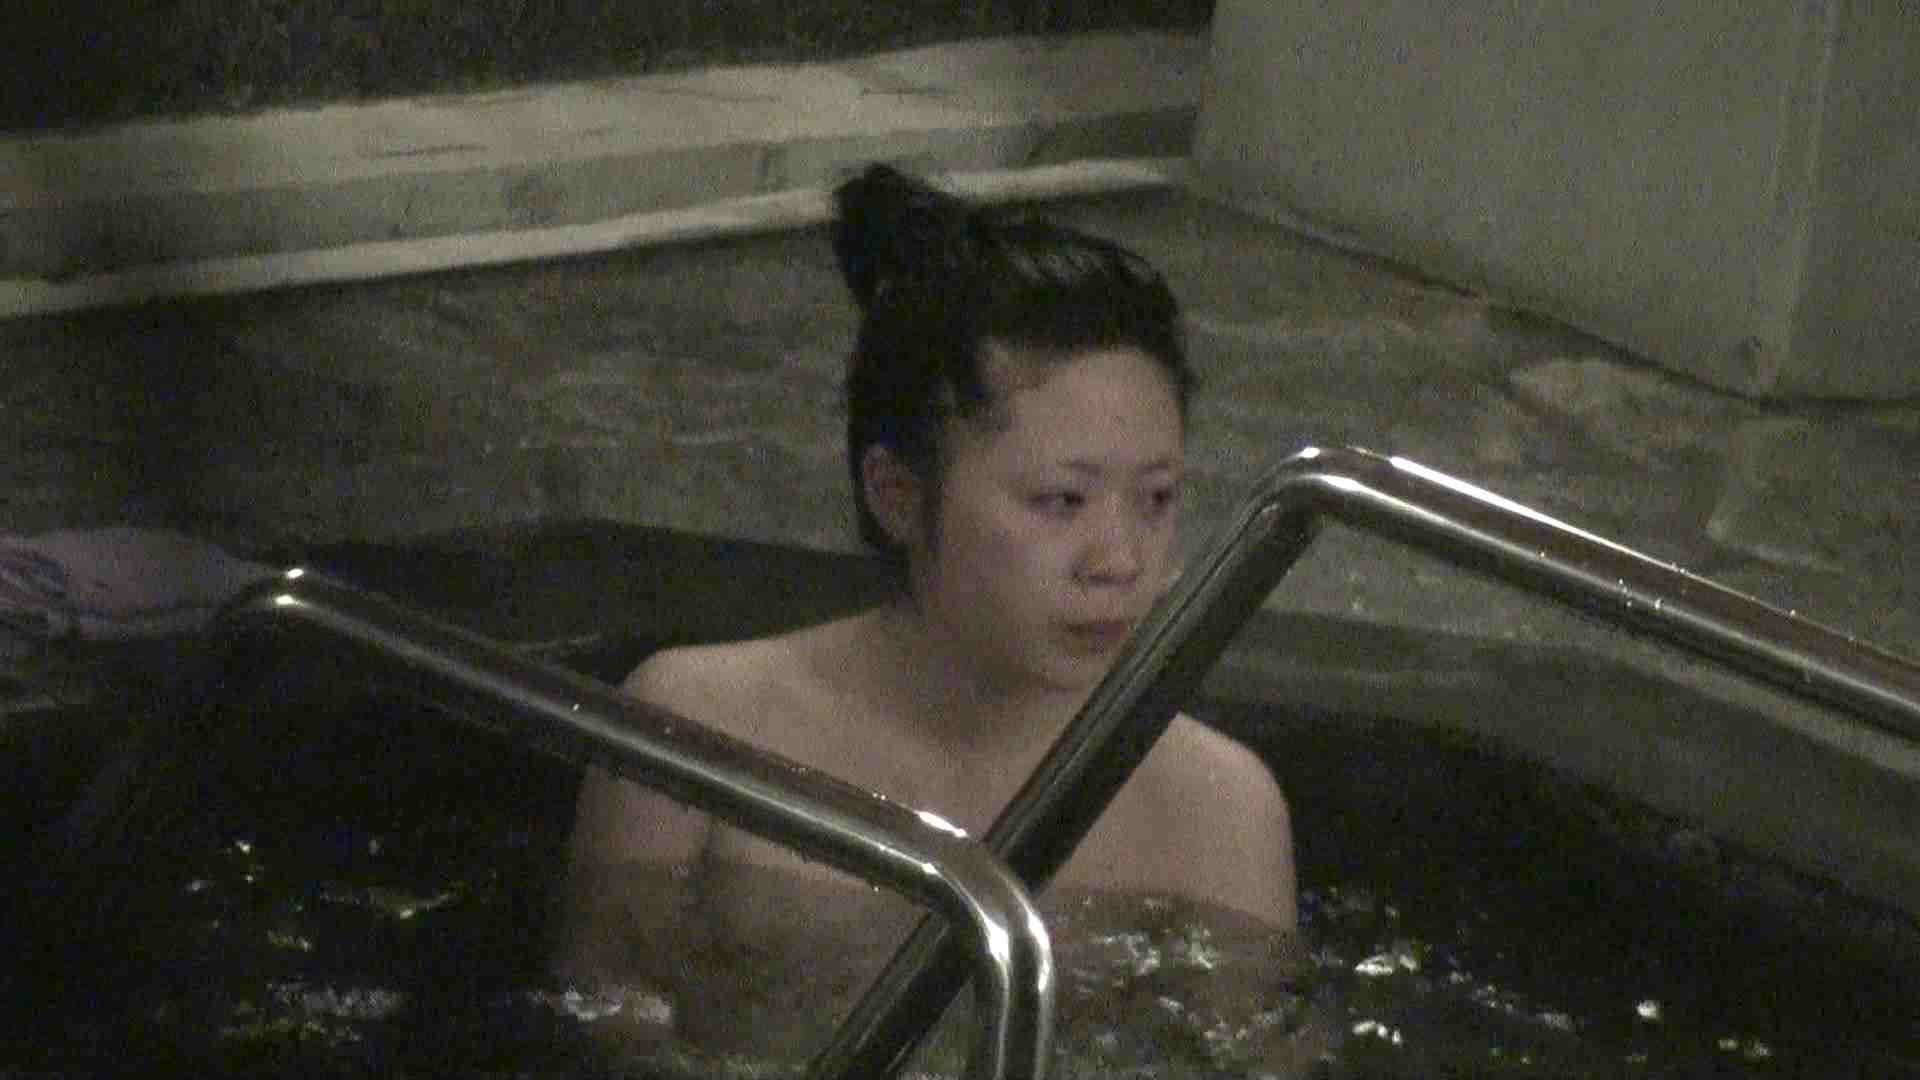 Aquaな露天風呂Vol.314 盗撮師作品  86pic 54